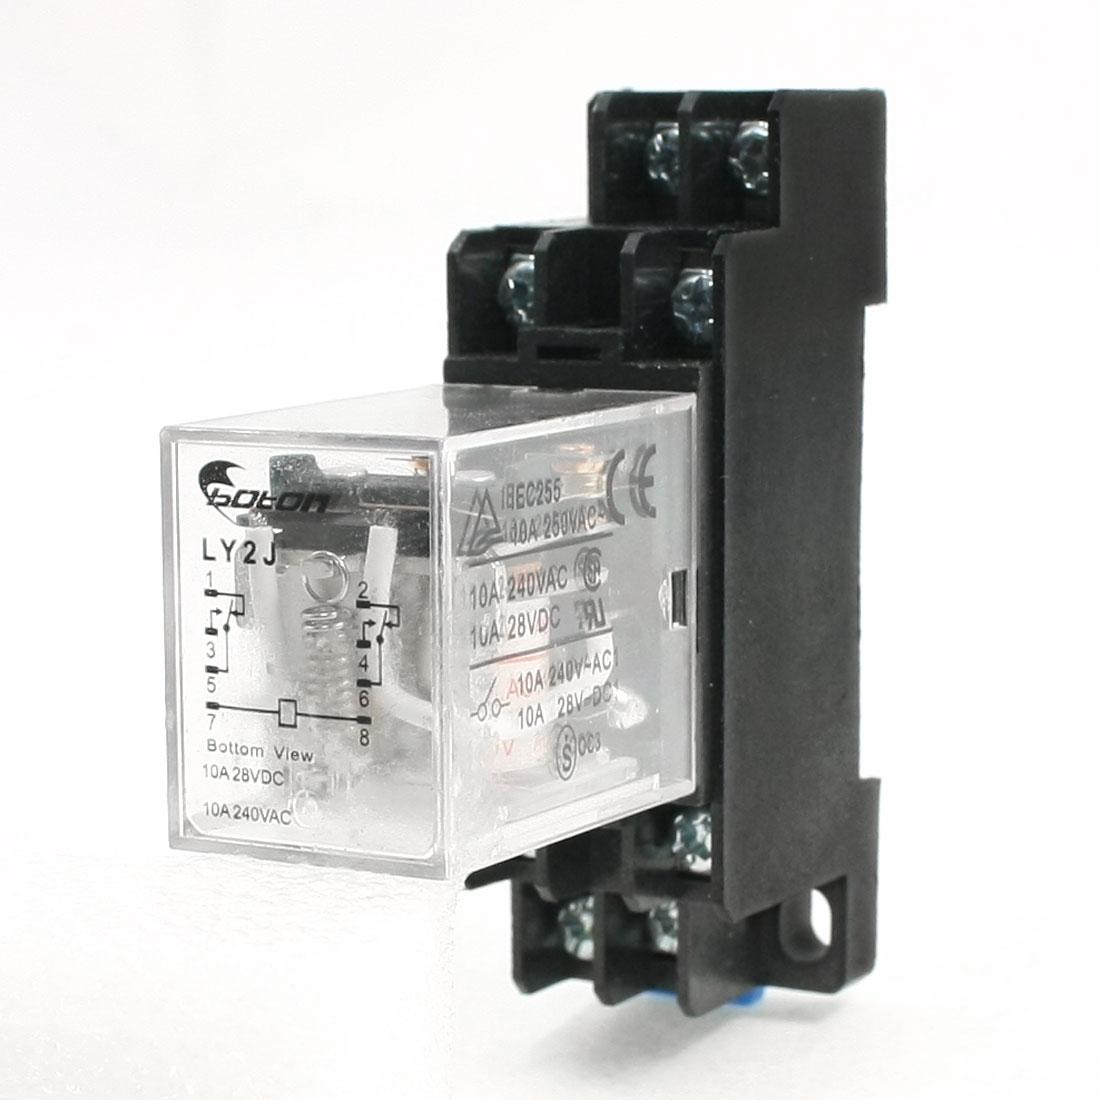 AC 110V Coil 8 Pin DIN Rail Electromagnetic Power Relay 8 Pin 10A LY2J w Base